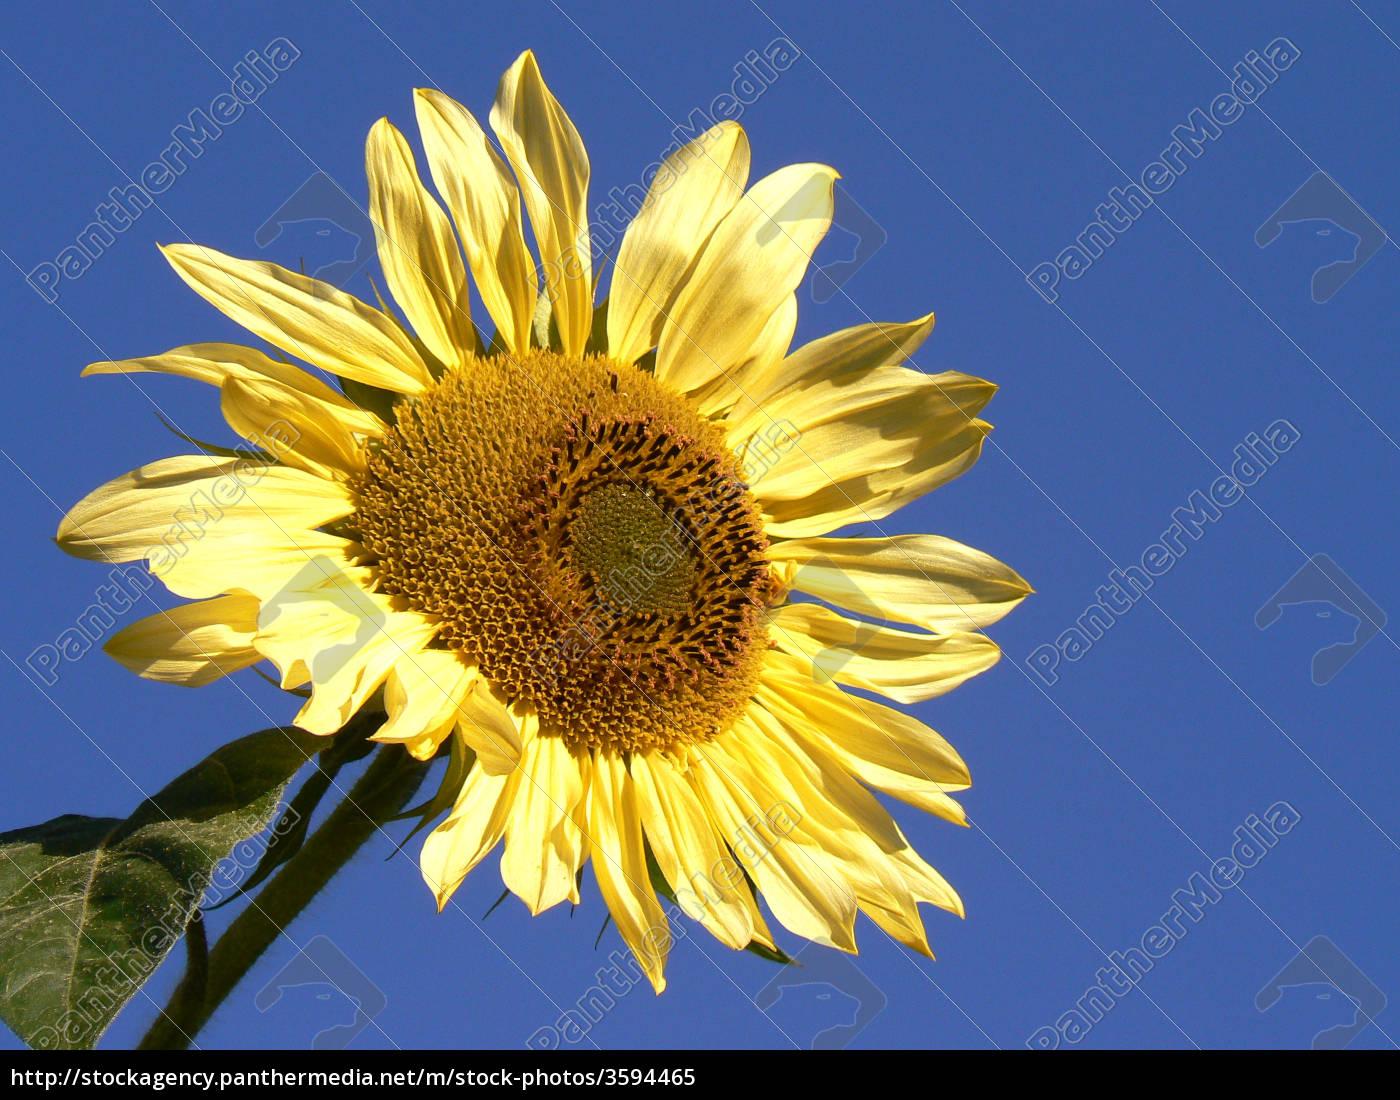 sonnenblume, vor, blauem, himmel - 3594465